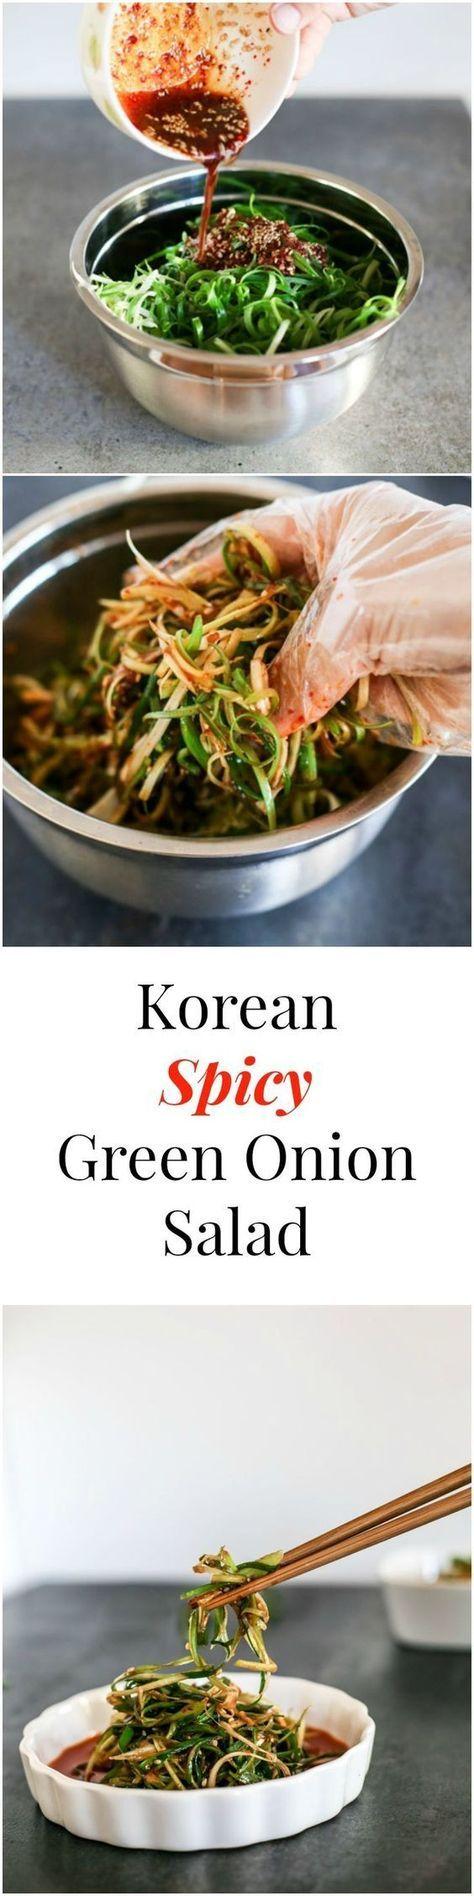 25+ best ideas about Korean pork belly on Pinterest ...